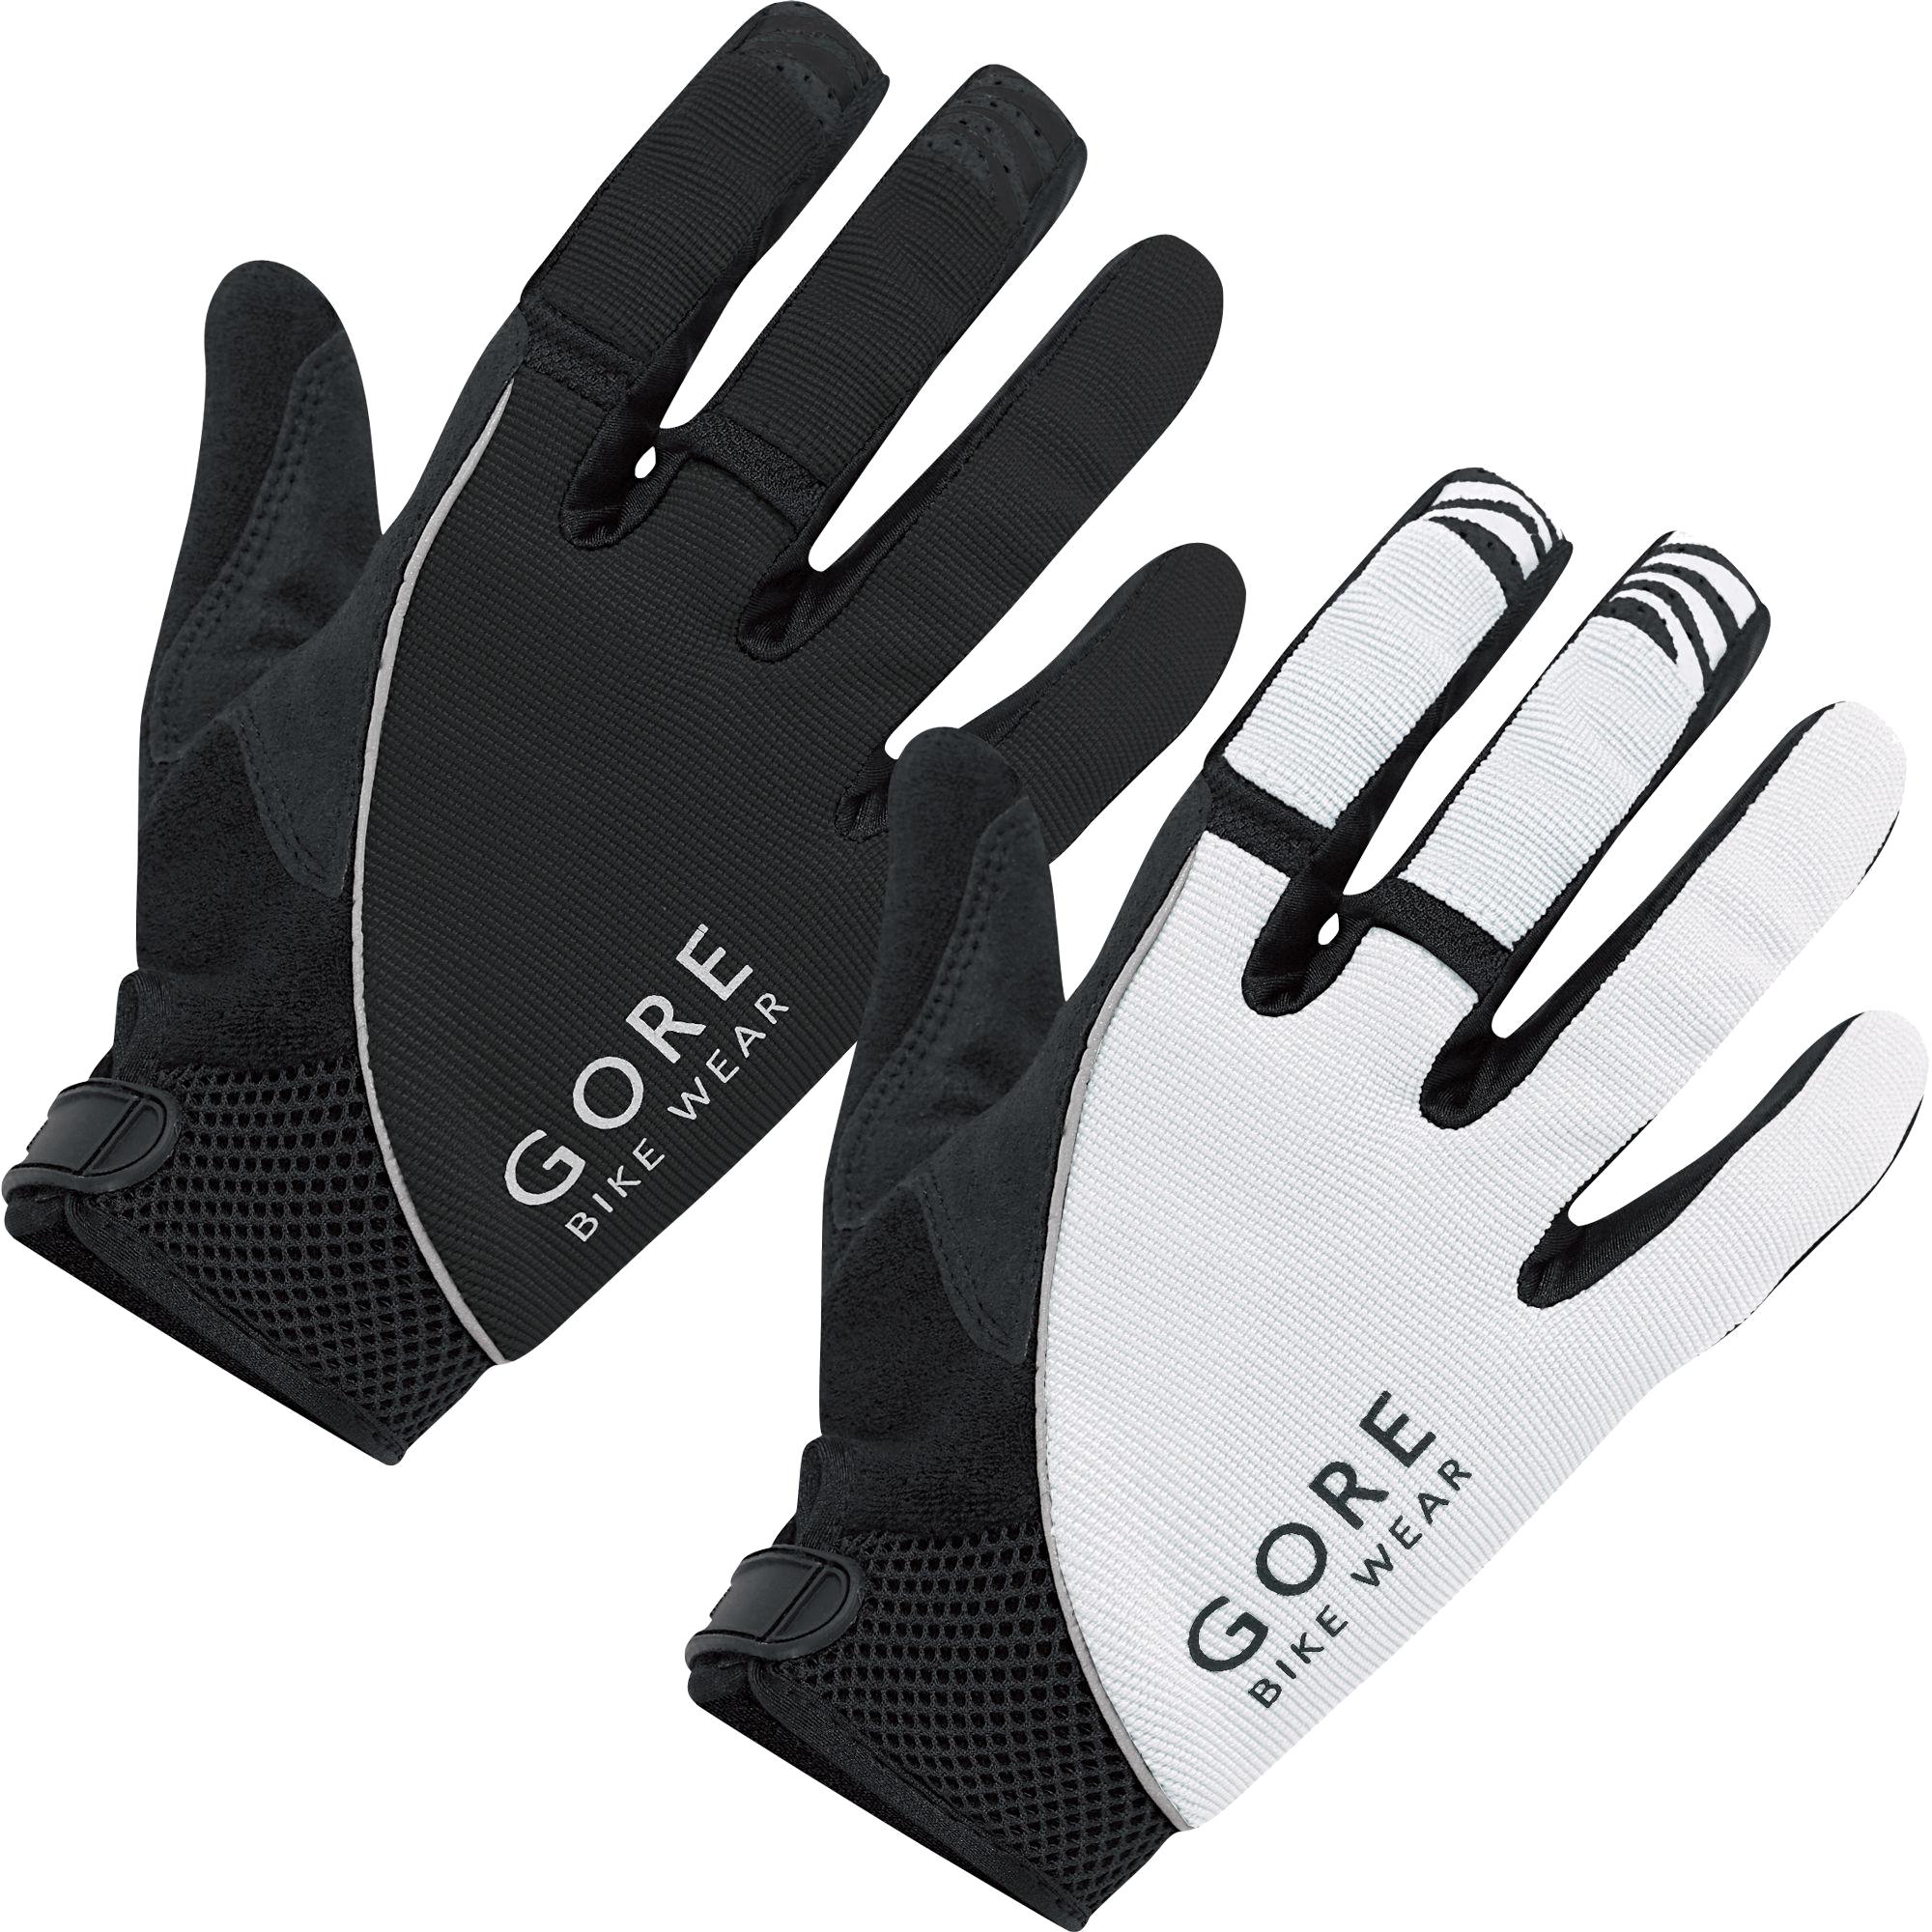 clipart free stock gloves vector golf glove #97149987